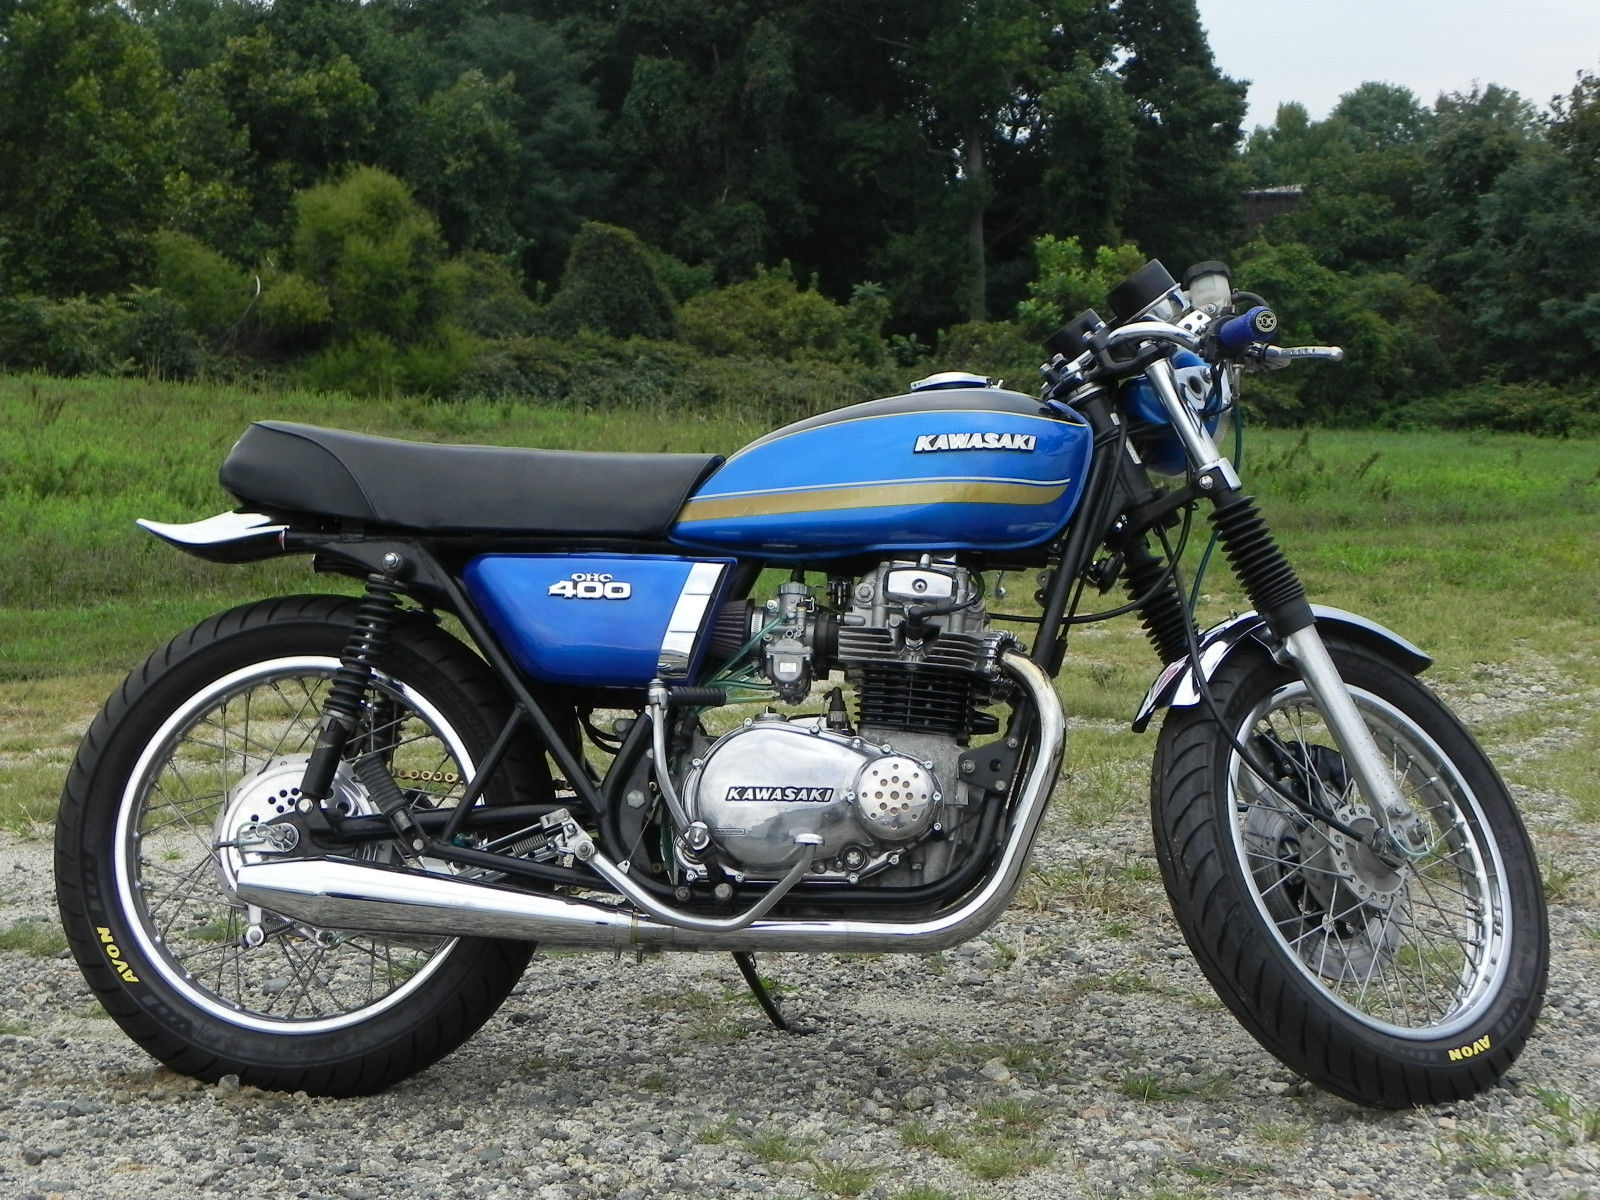 1974 Kawasaki KZ400 Cafe Racer Other